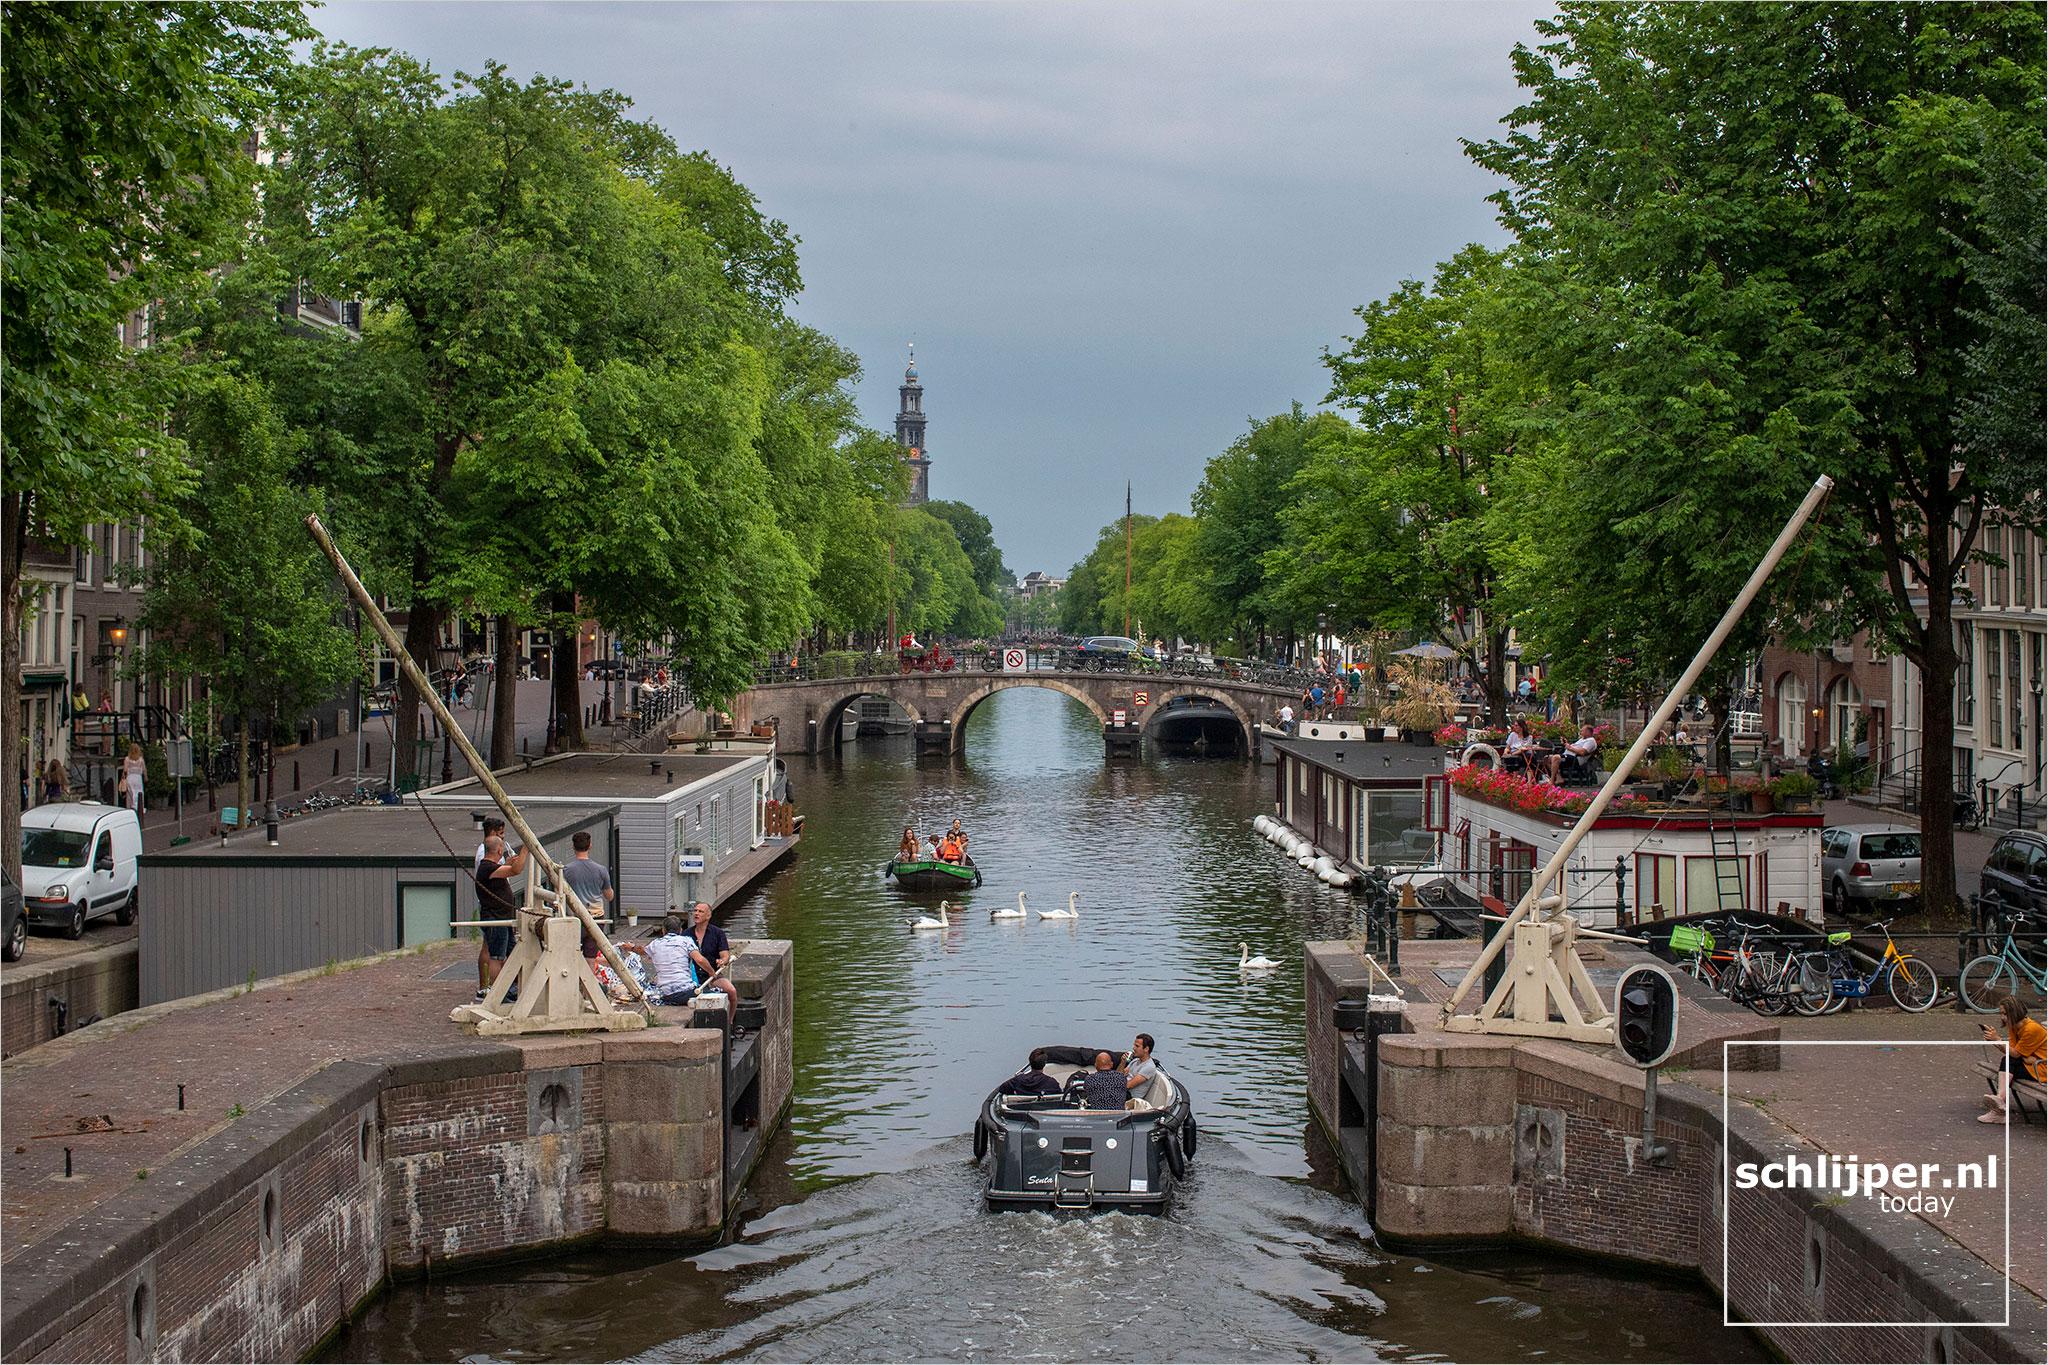 Nederland, Amsterdam, 26 juni 2020